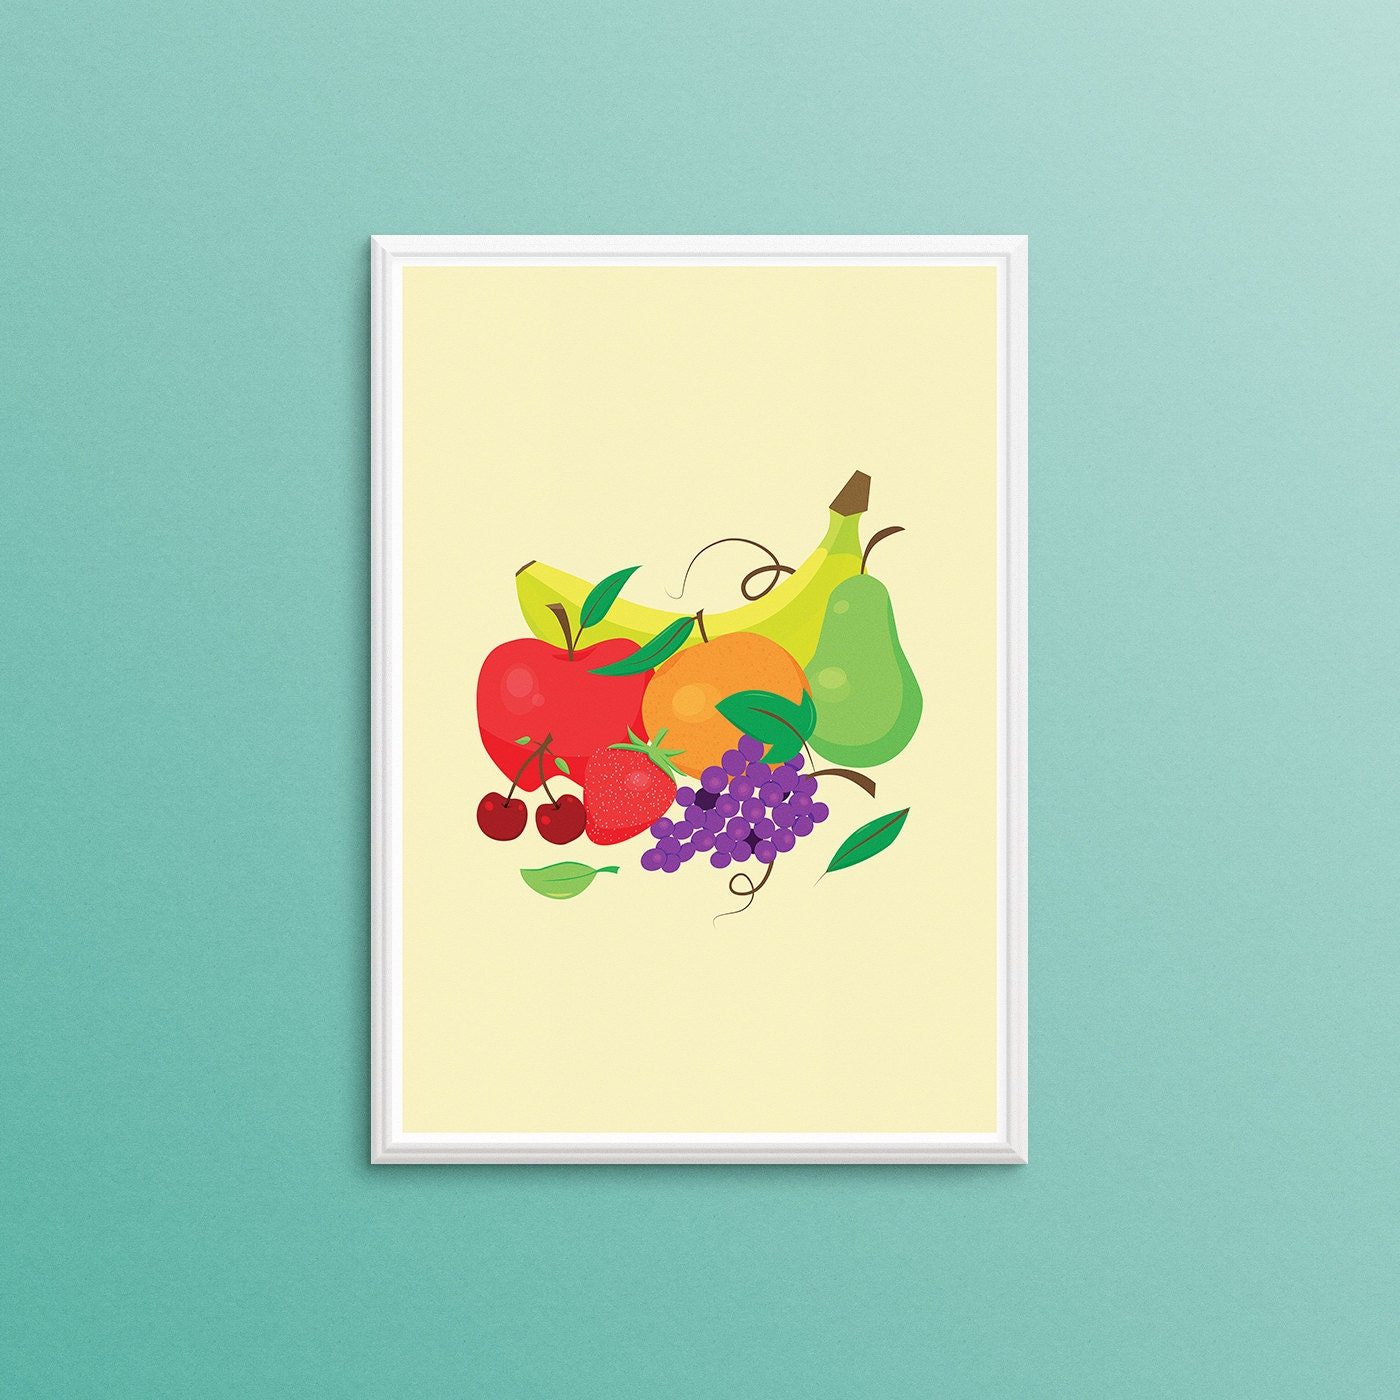 Kitchen Wall Art. Digital Download. Kitchen Poster. Food Art.